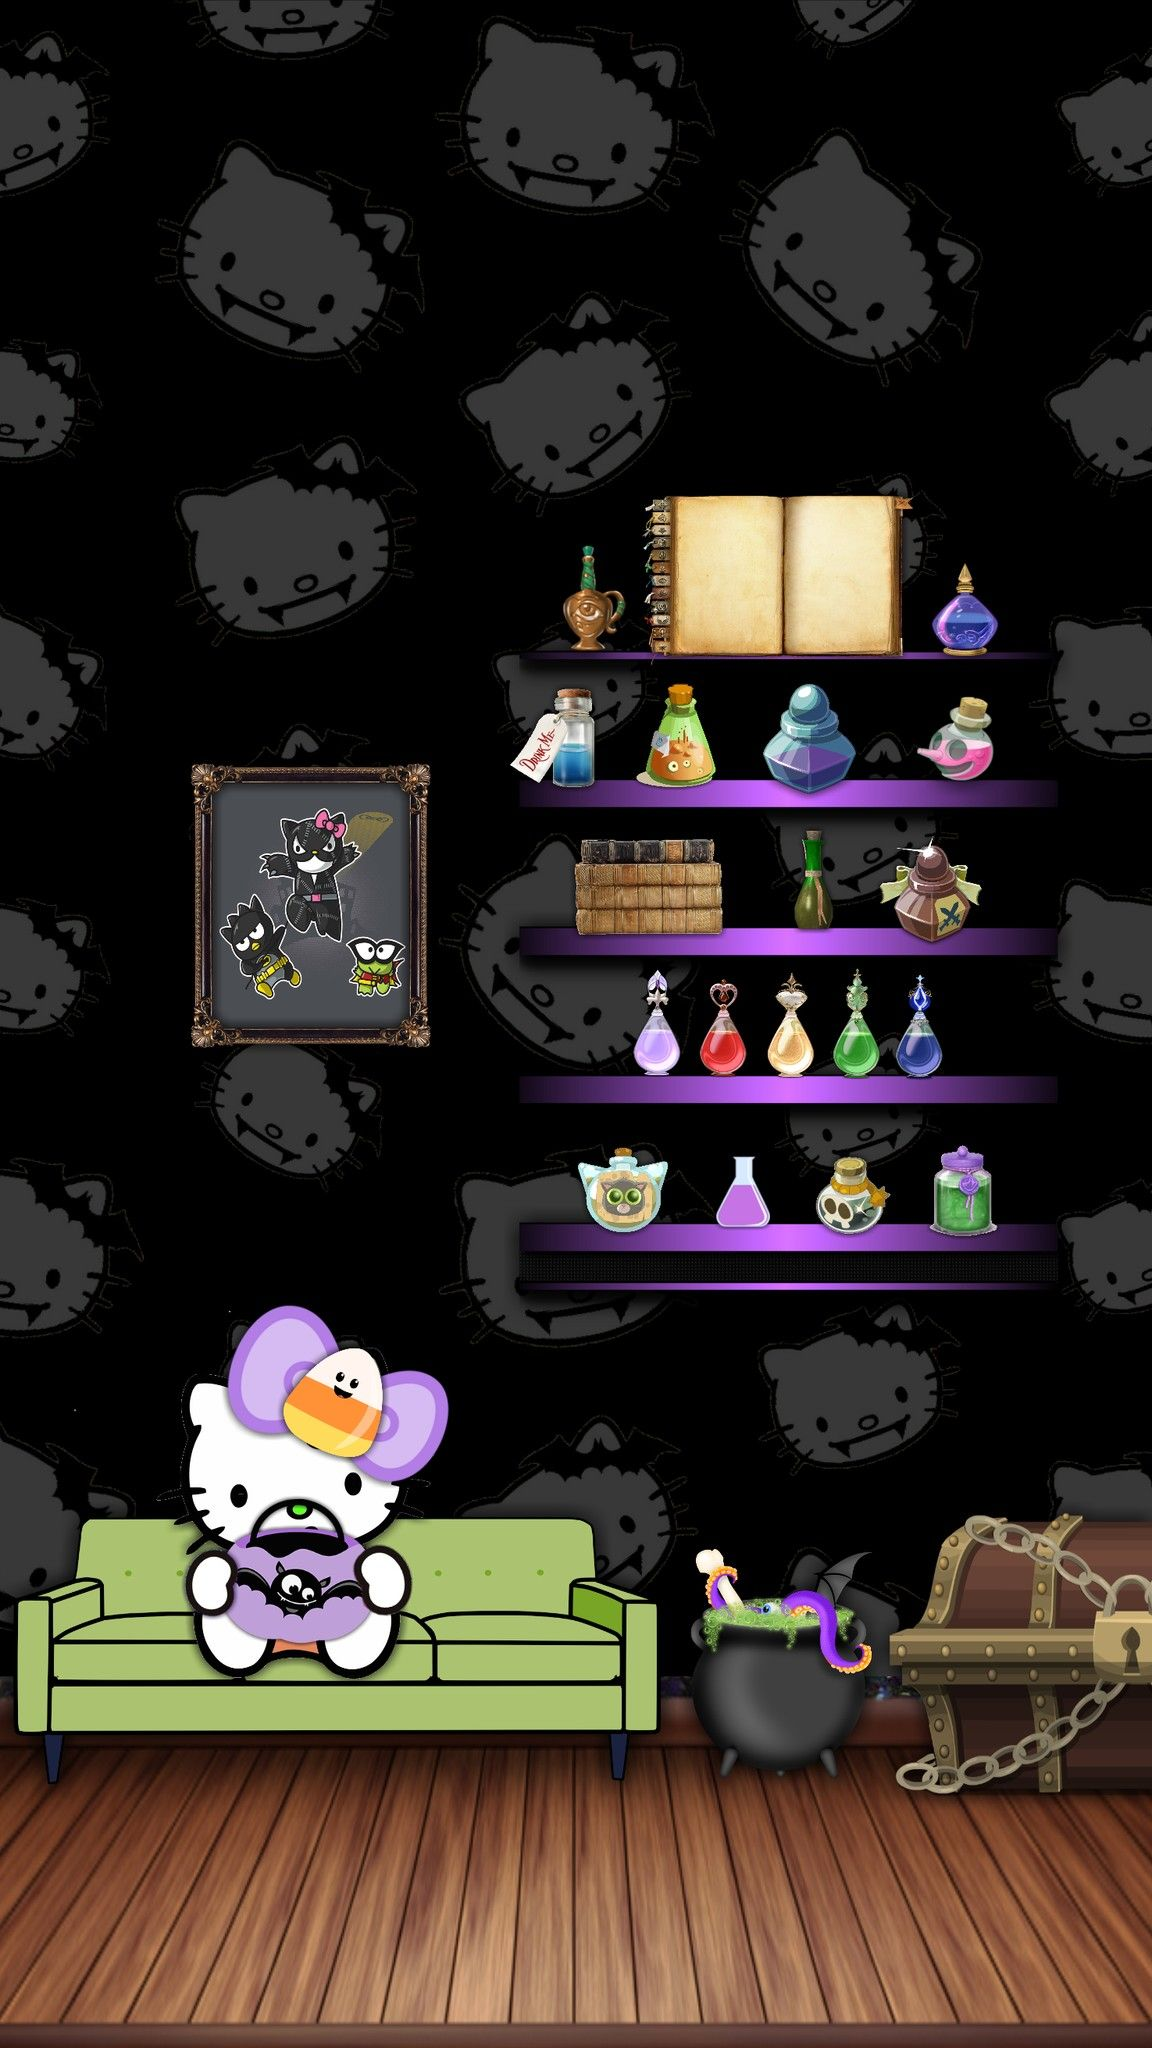 Wonderful Wallpaper Halloween Hello Kitty - 903376421673be4dab5b4e8d9704764a  Pic_516540.jpg